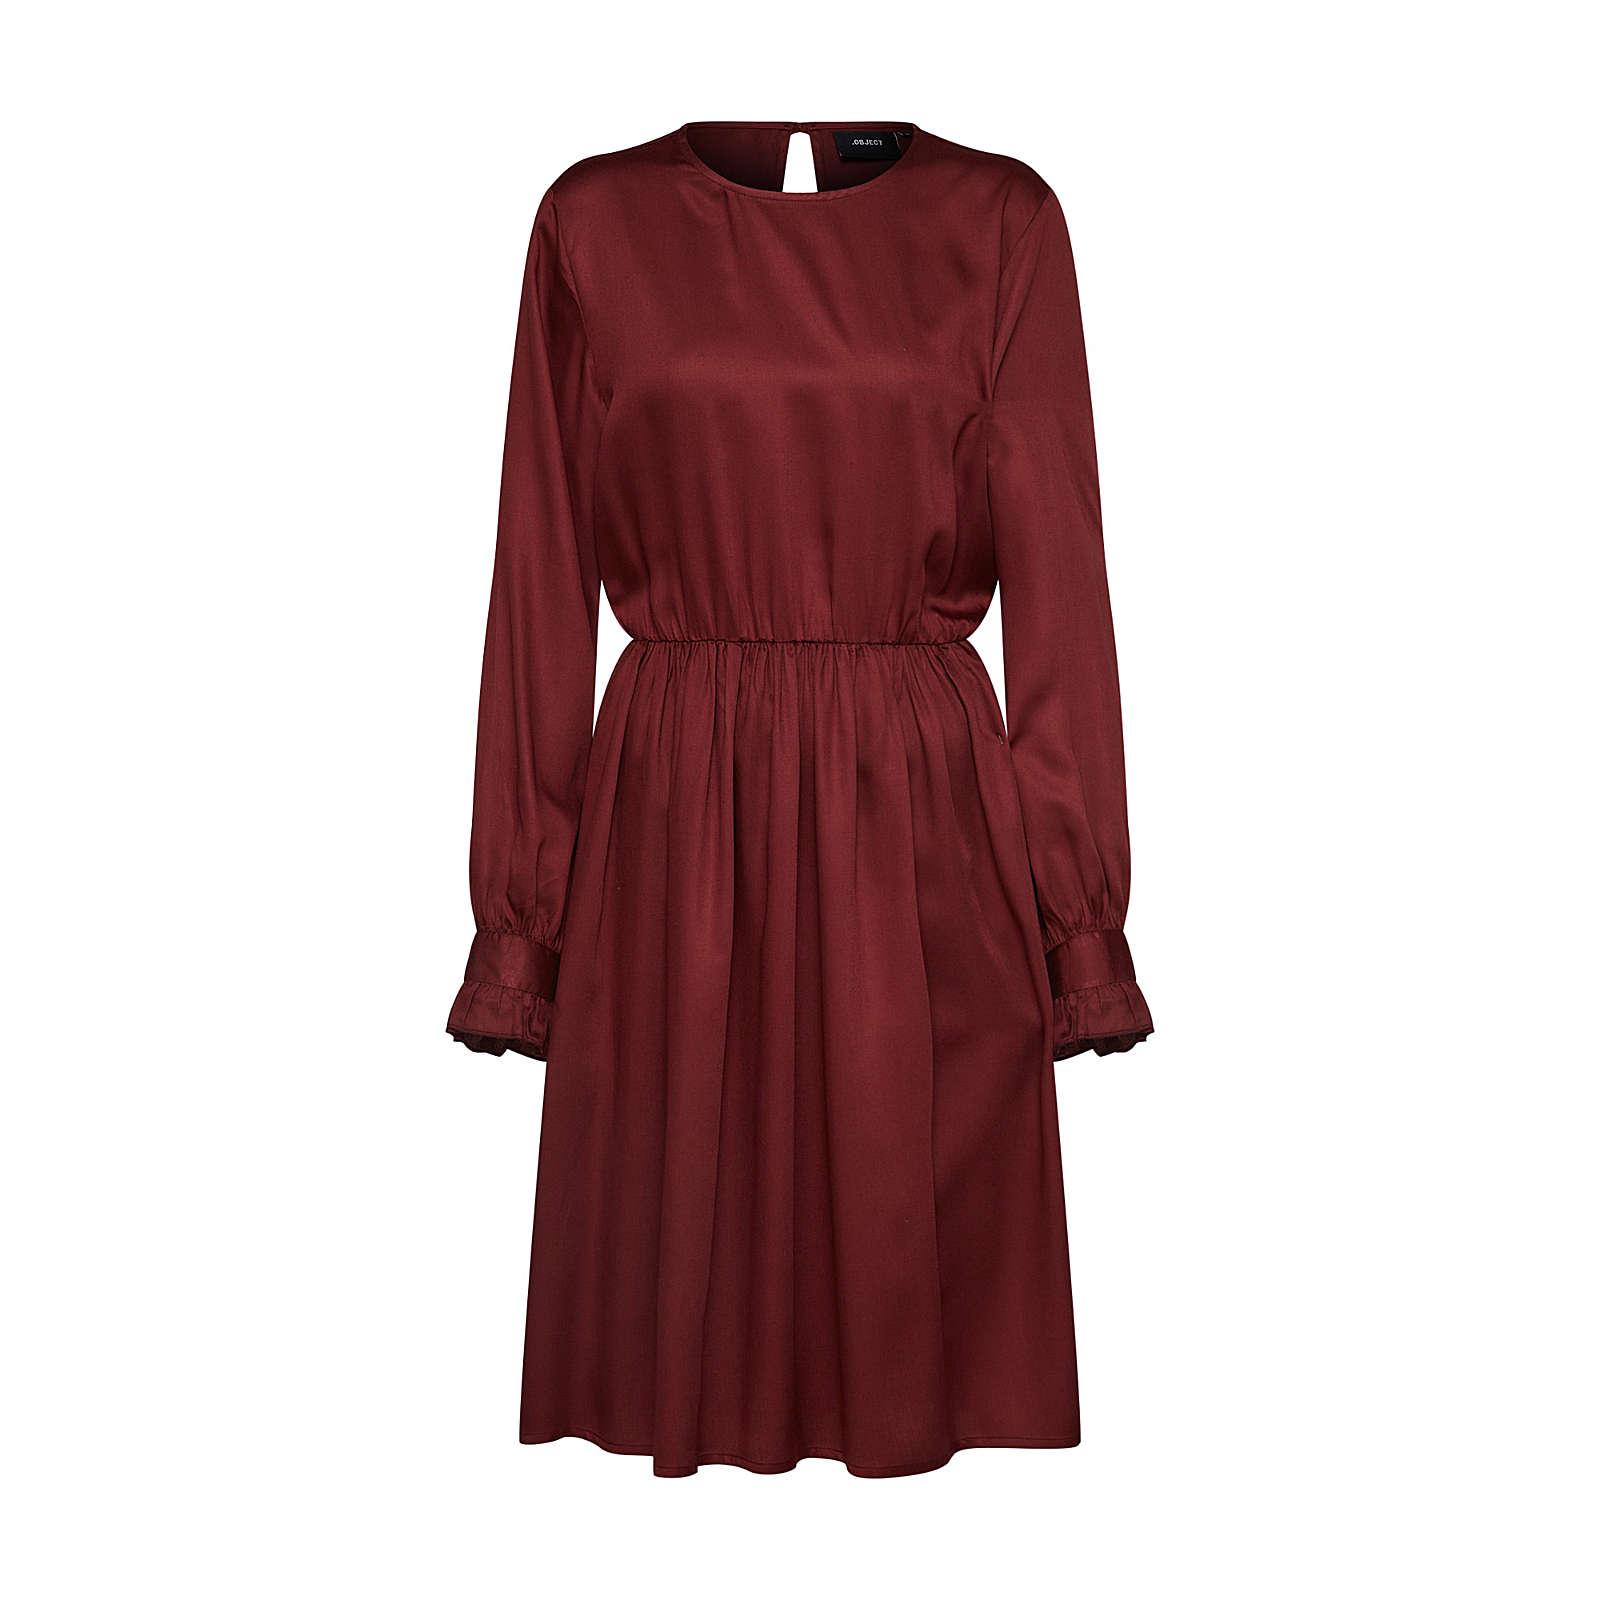 OBJECT Blusenkleid Blusenkleider bordeaux Damen Gr. 34